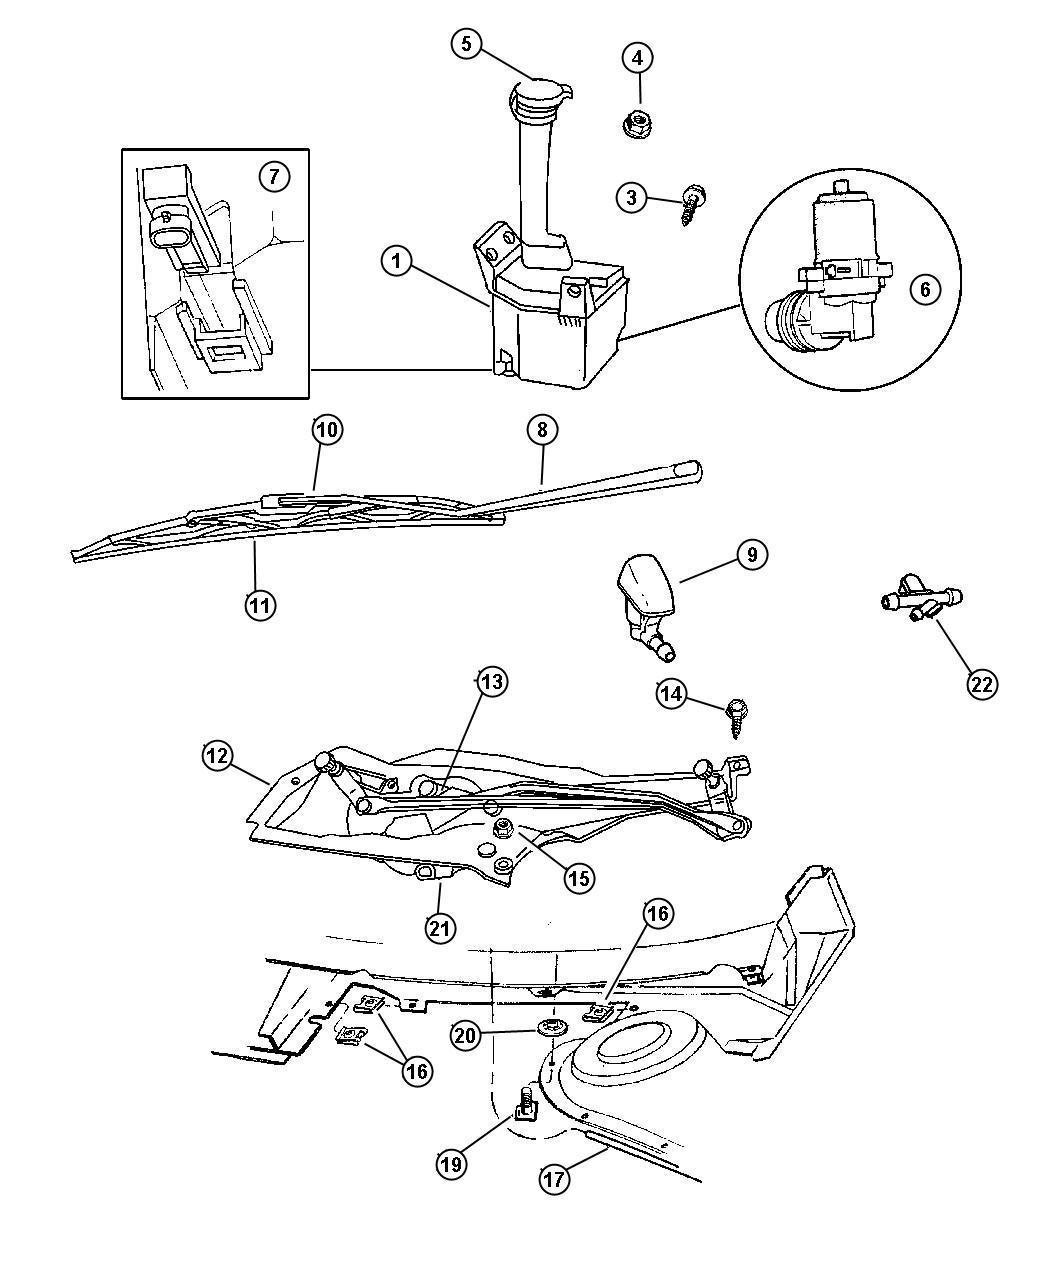 1997 Dodge Intrepid Linkage  Wiper Arm  Lower Link